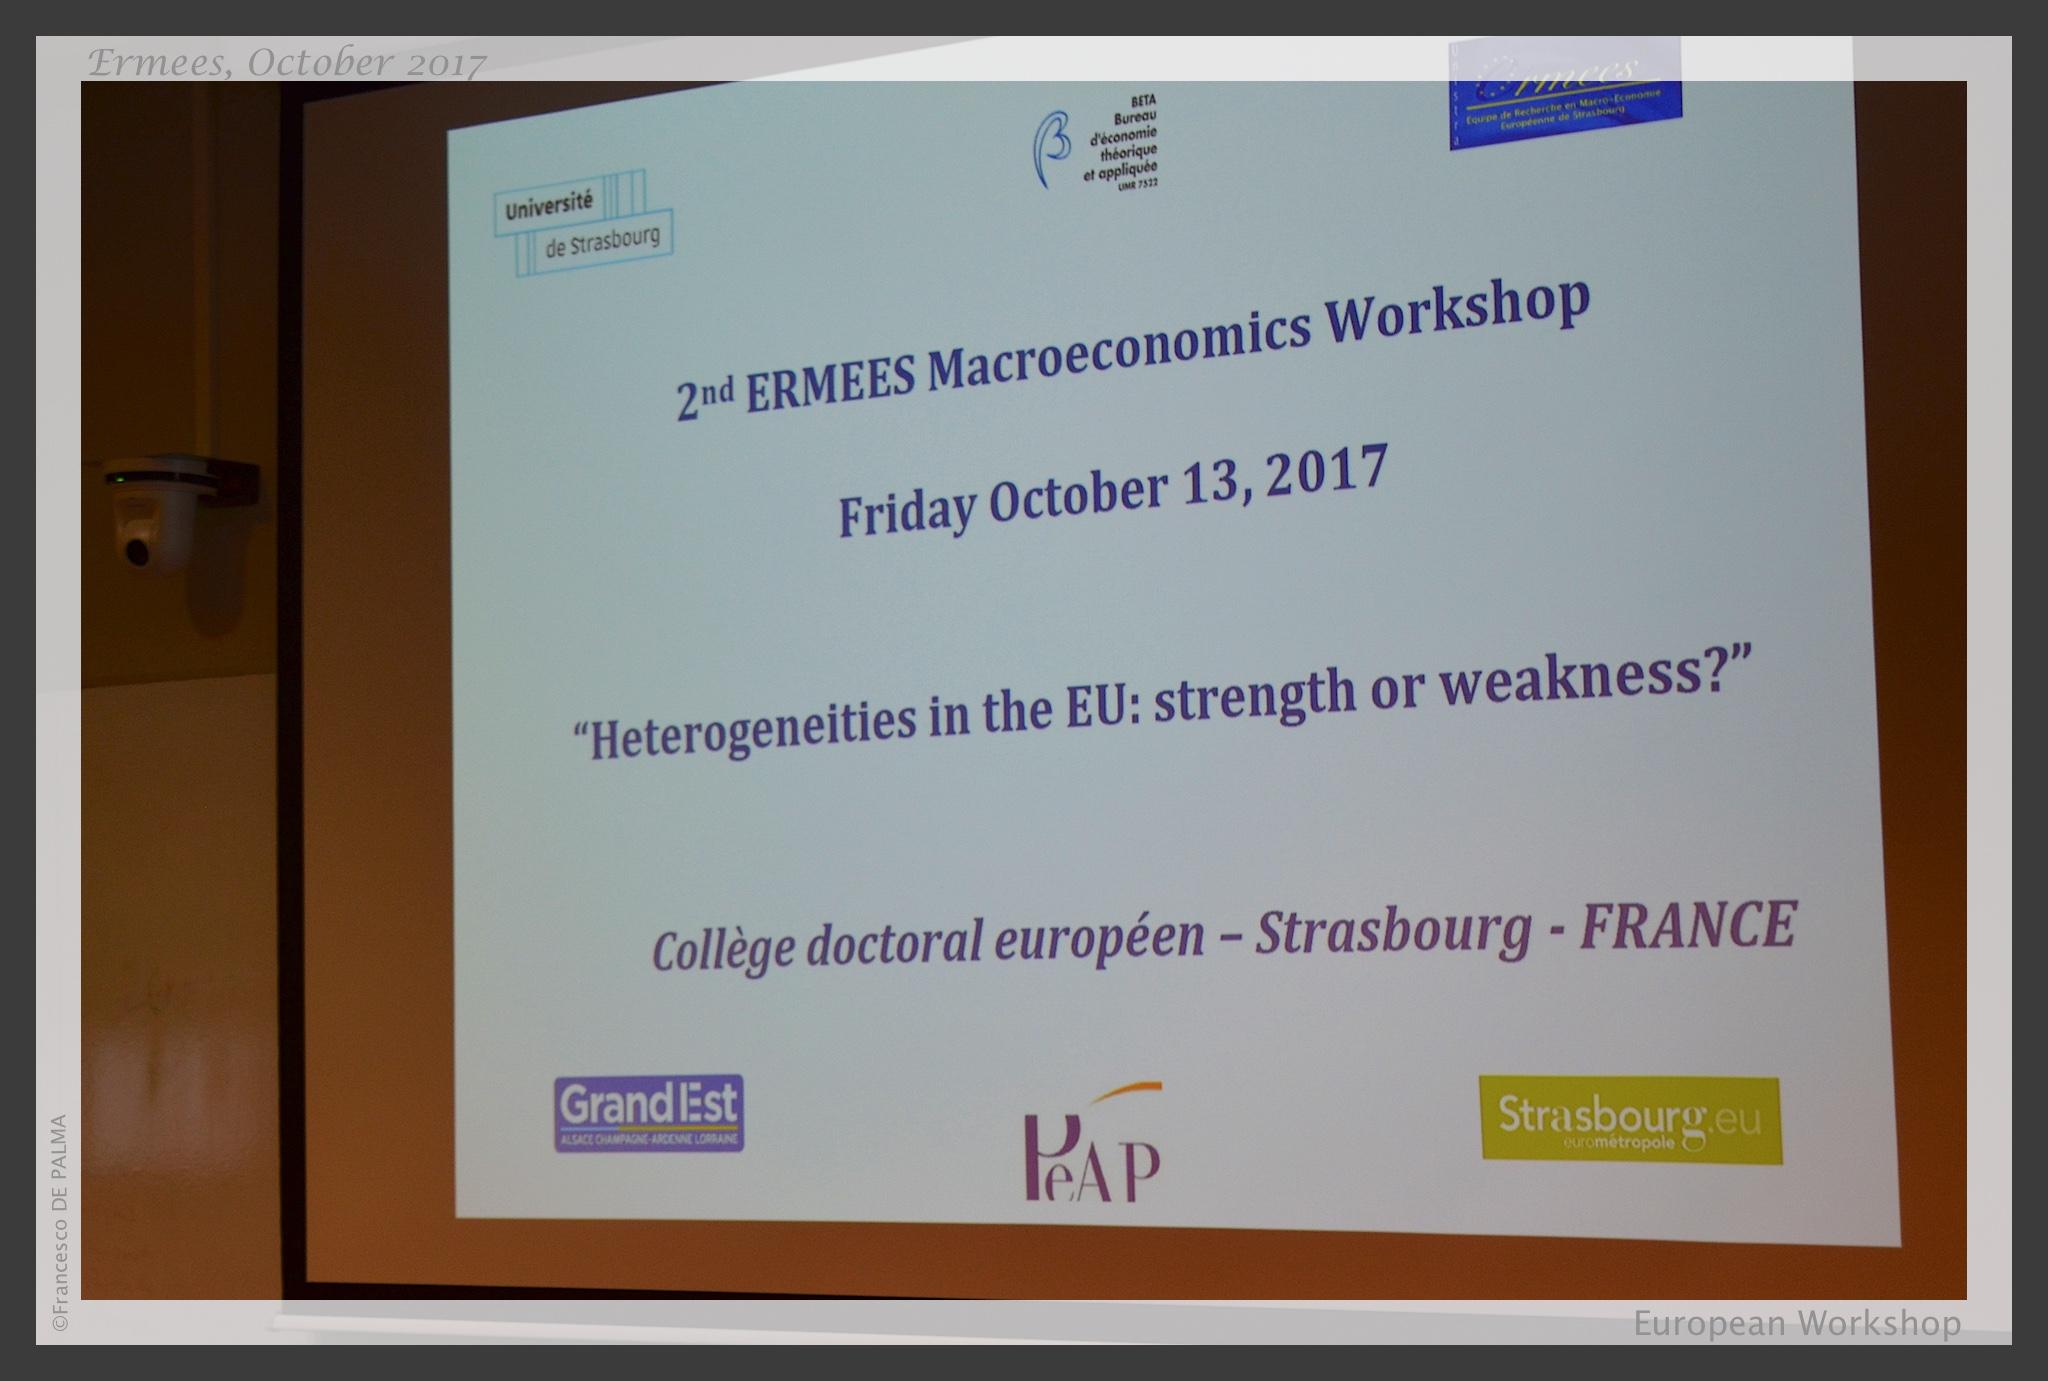 Ermees, October 2017